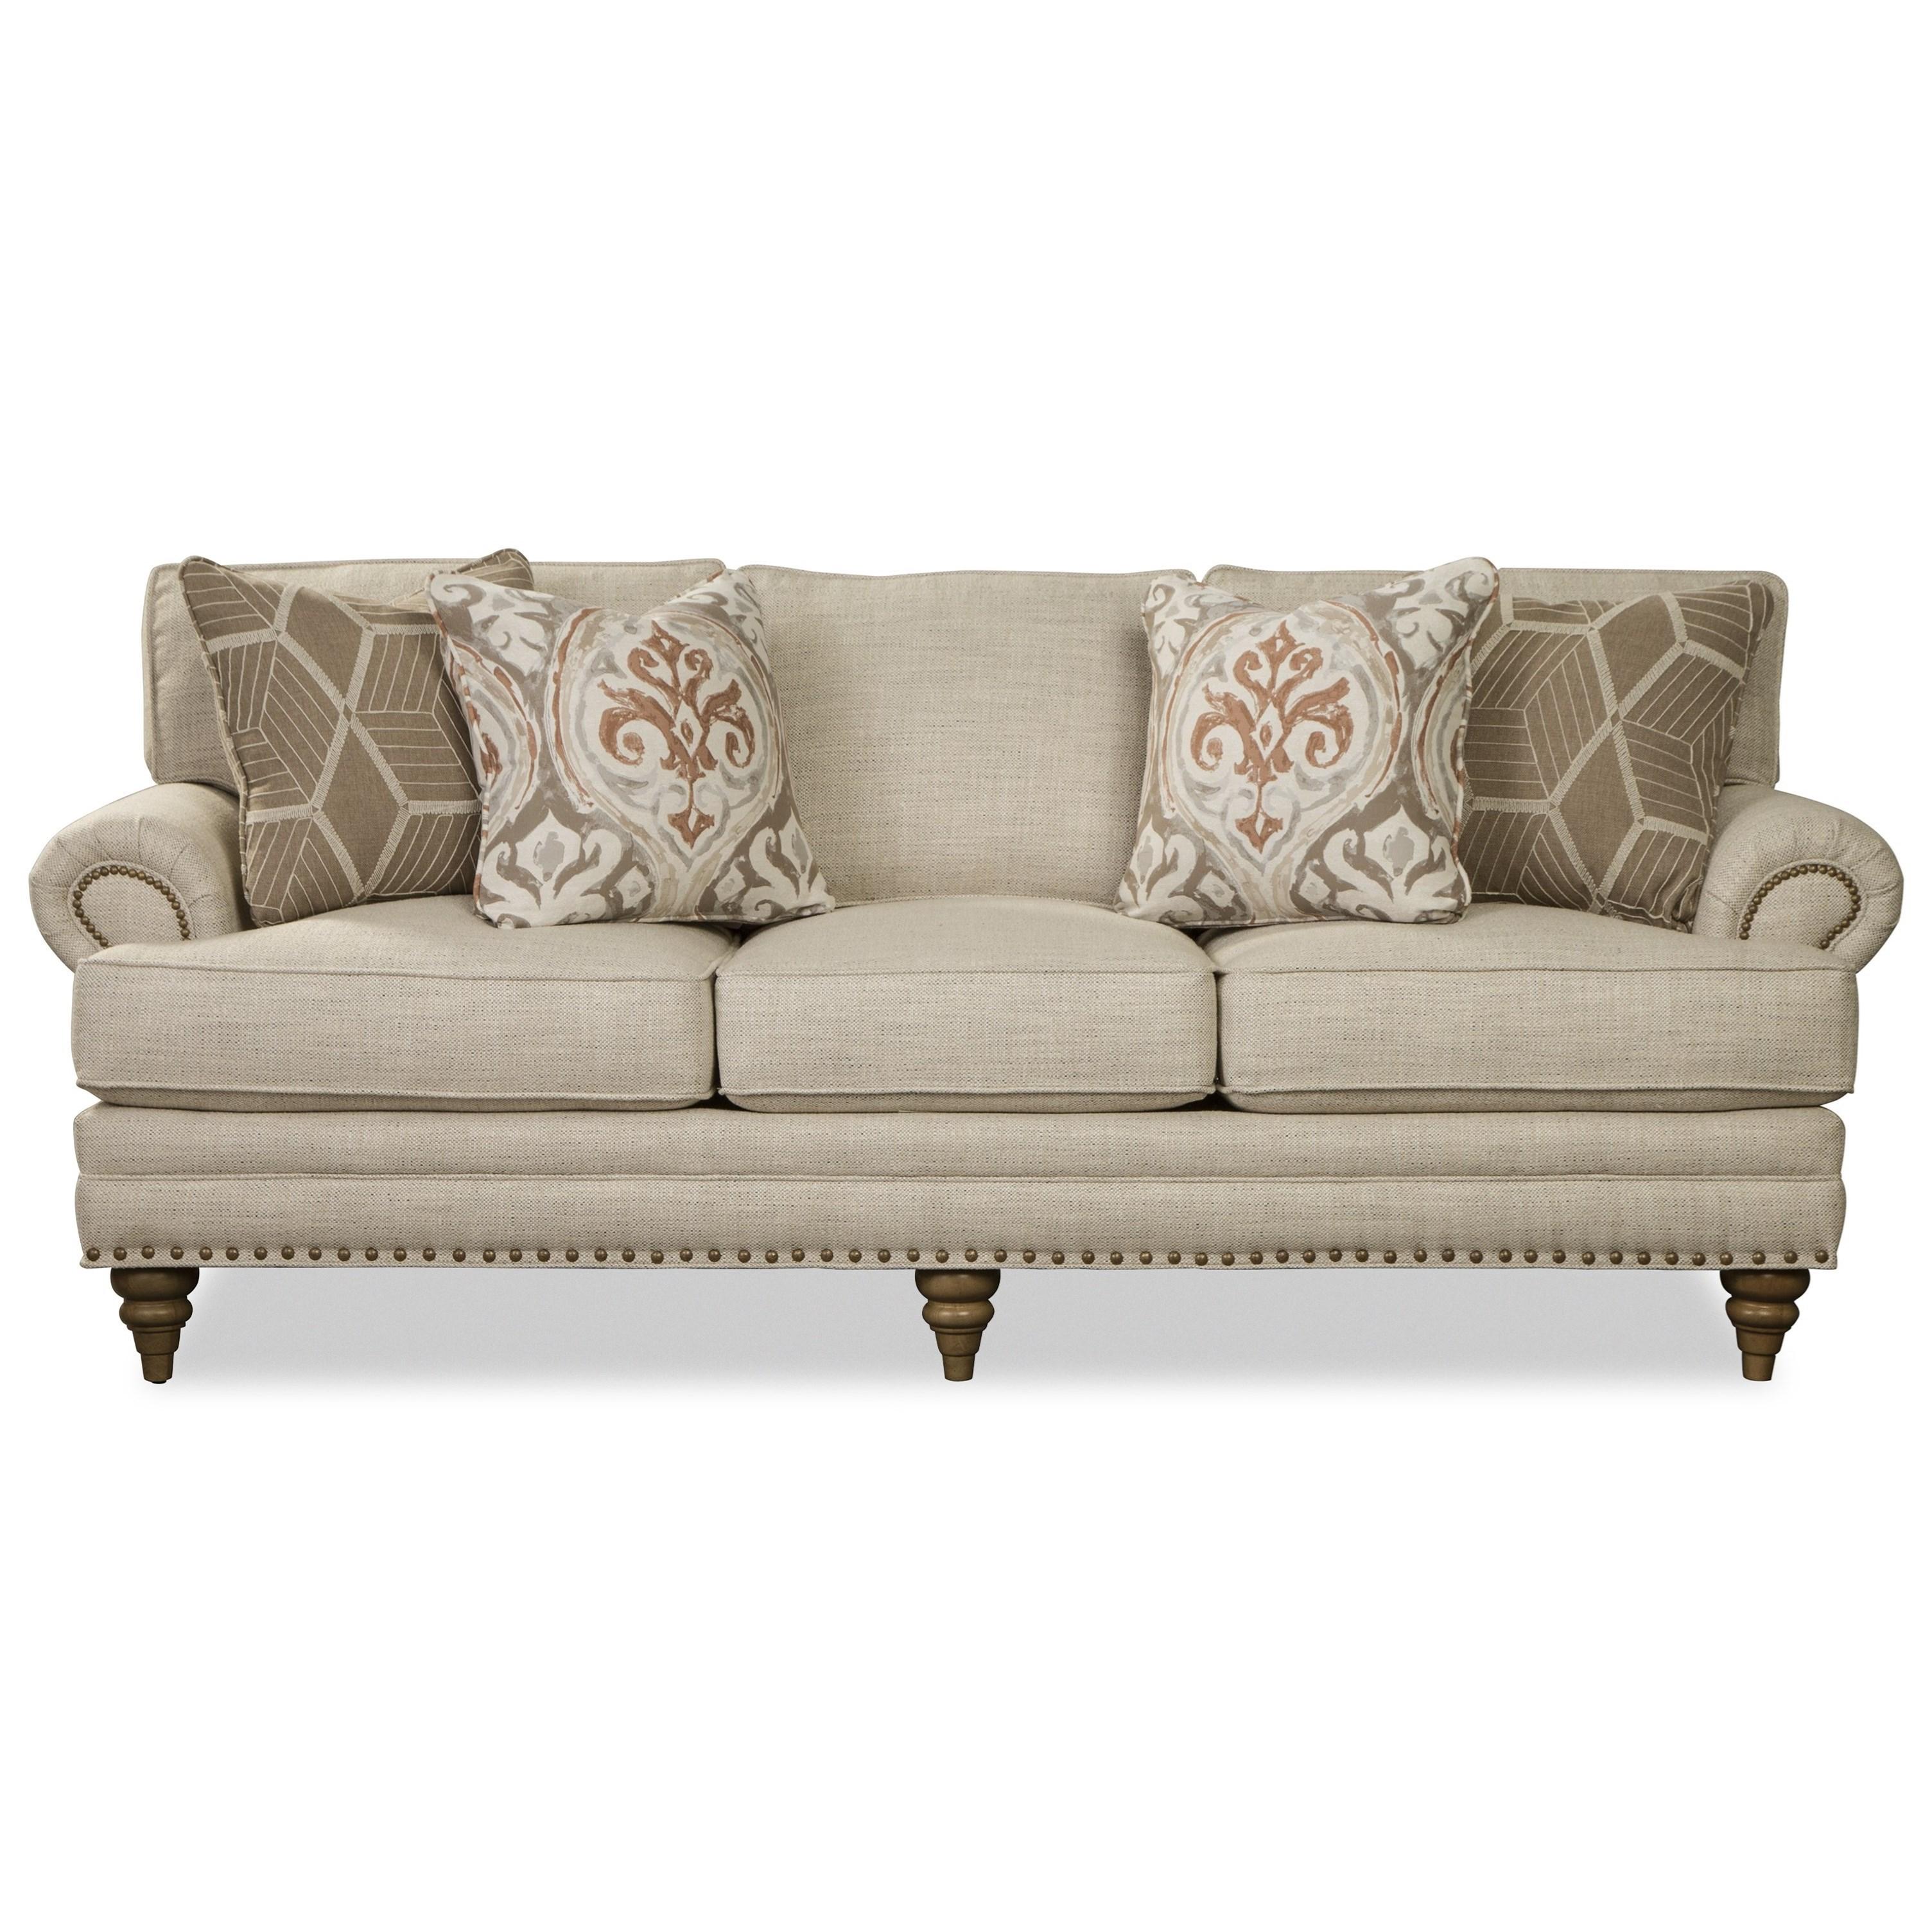 P794650 Sofa by Paula Deen by Craftmaster at Zak's Home